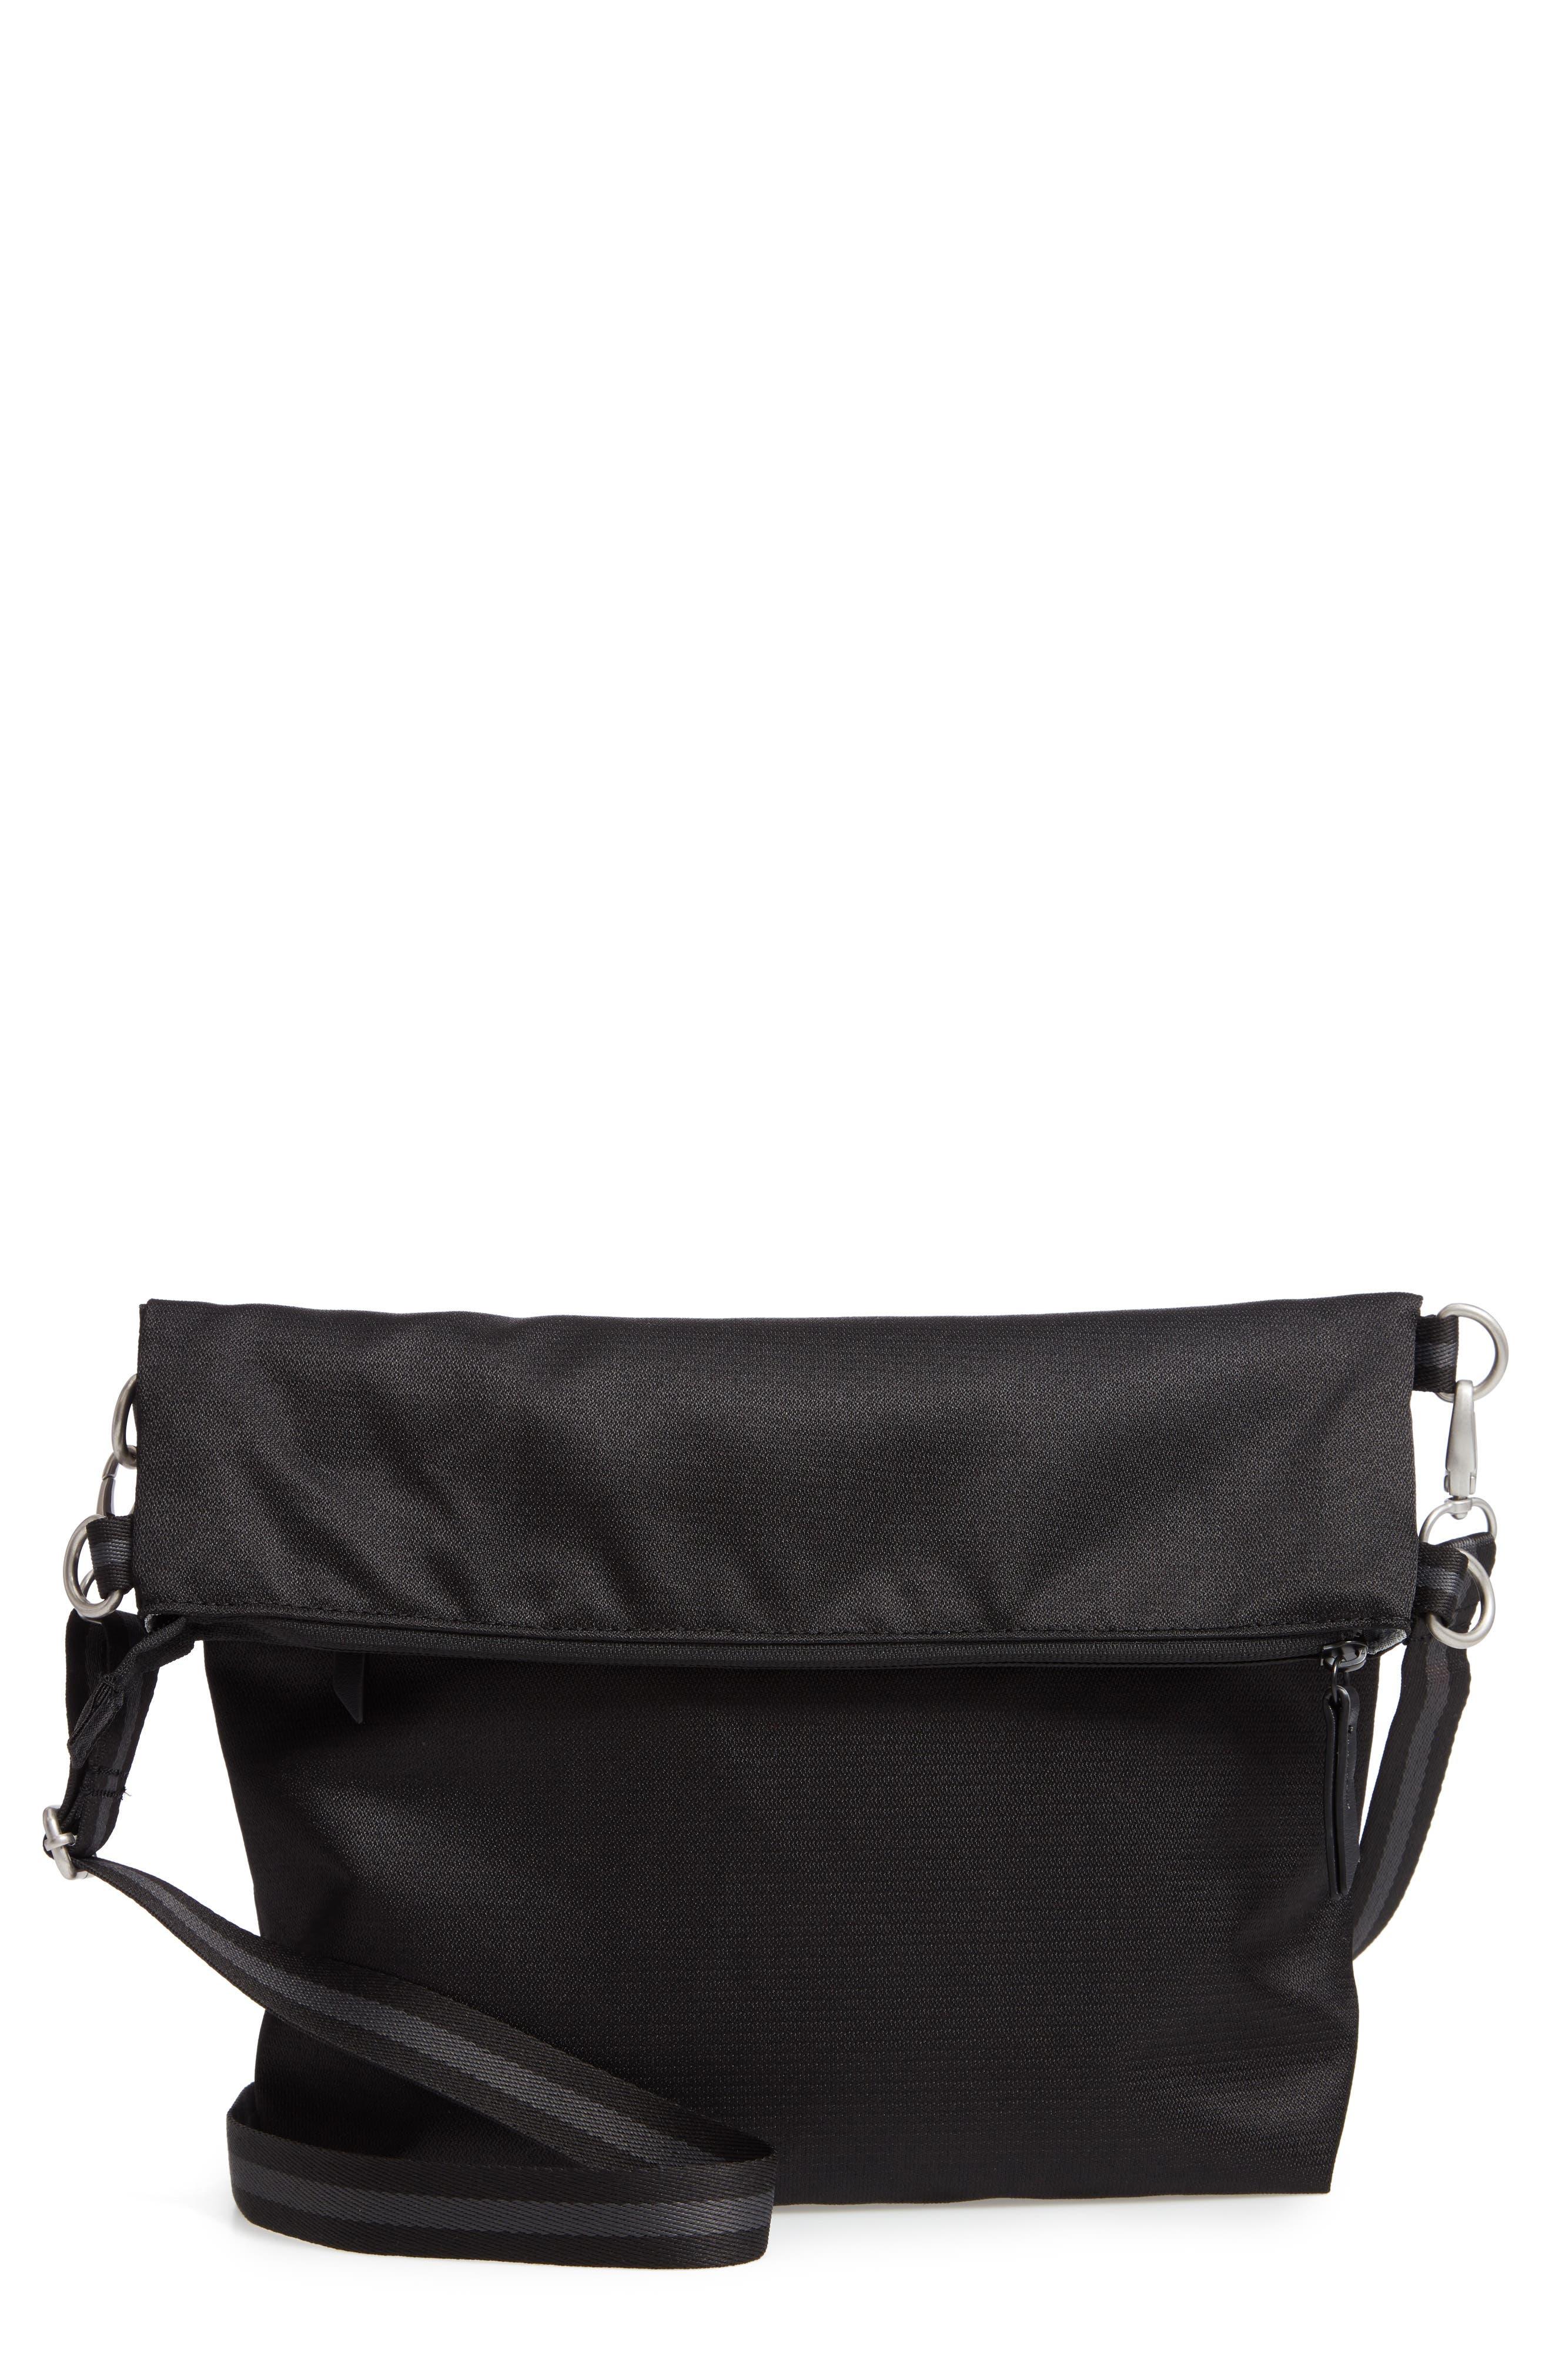 Vale RFID Crossbody Bag,                             Main thumbnail 1, color,                             BLACK/ BLACK